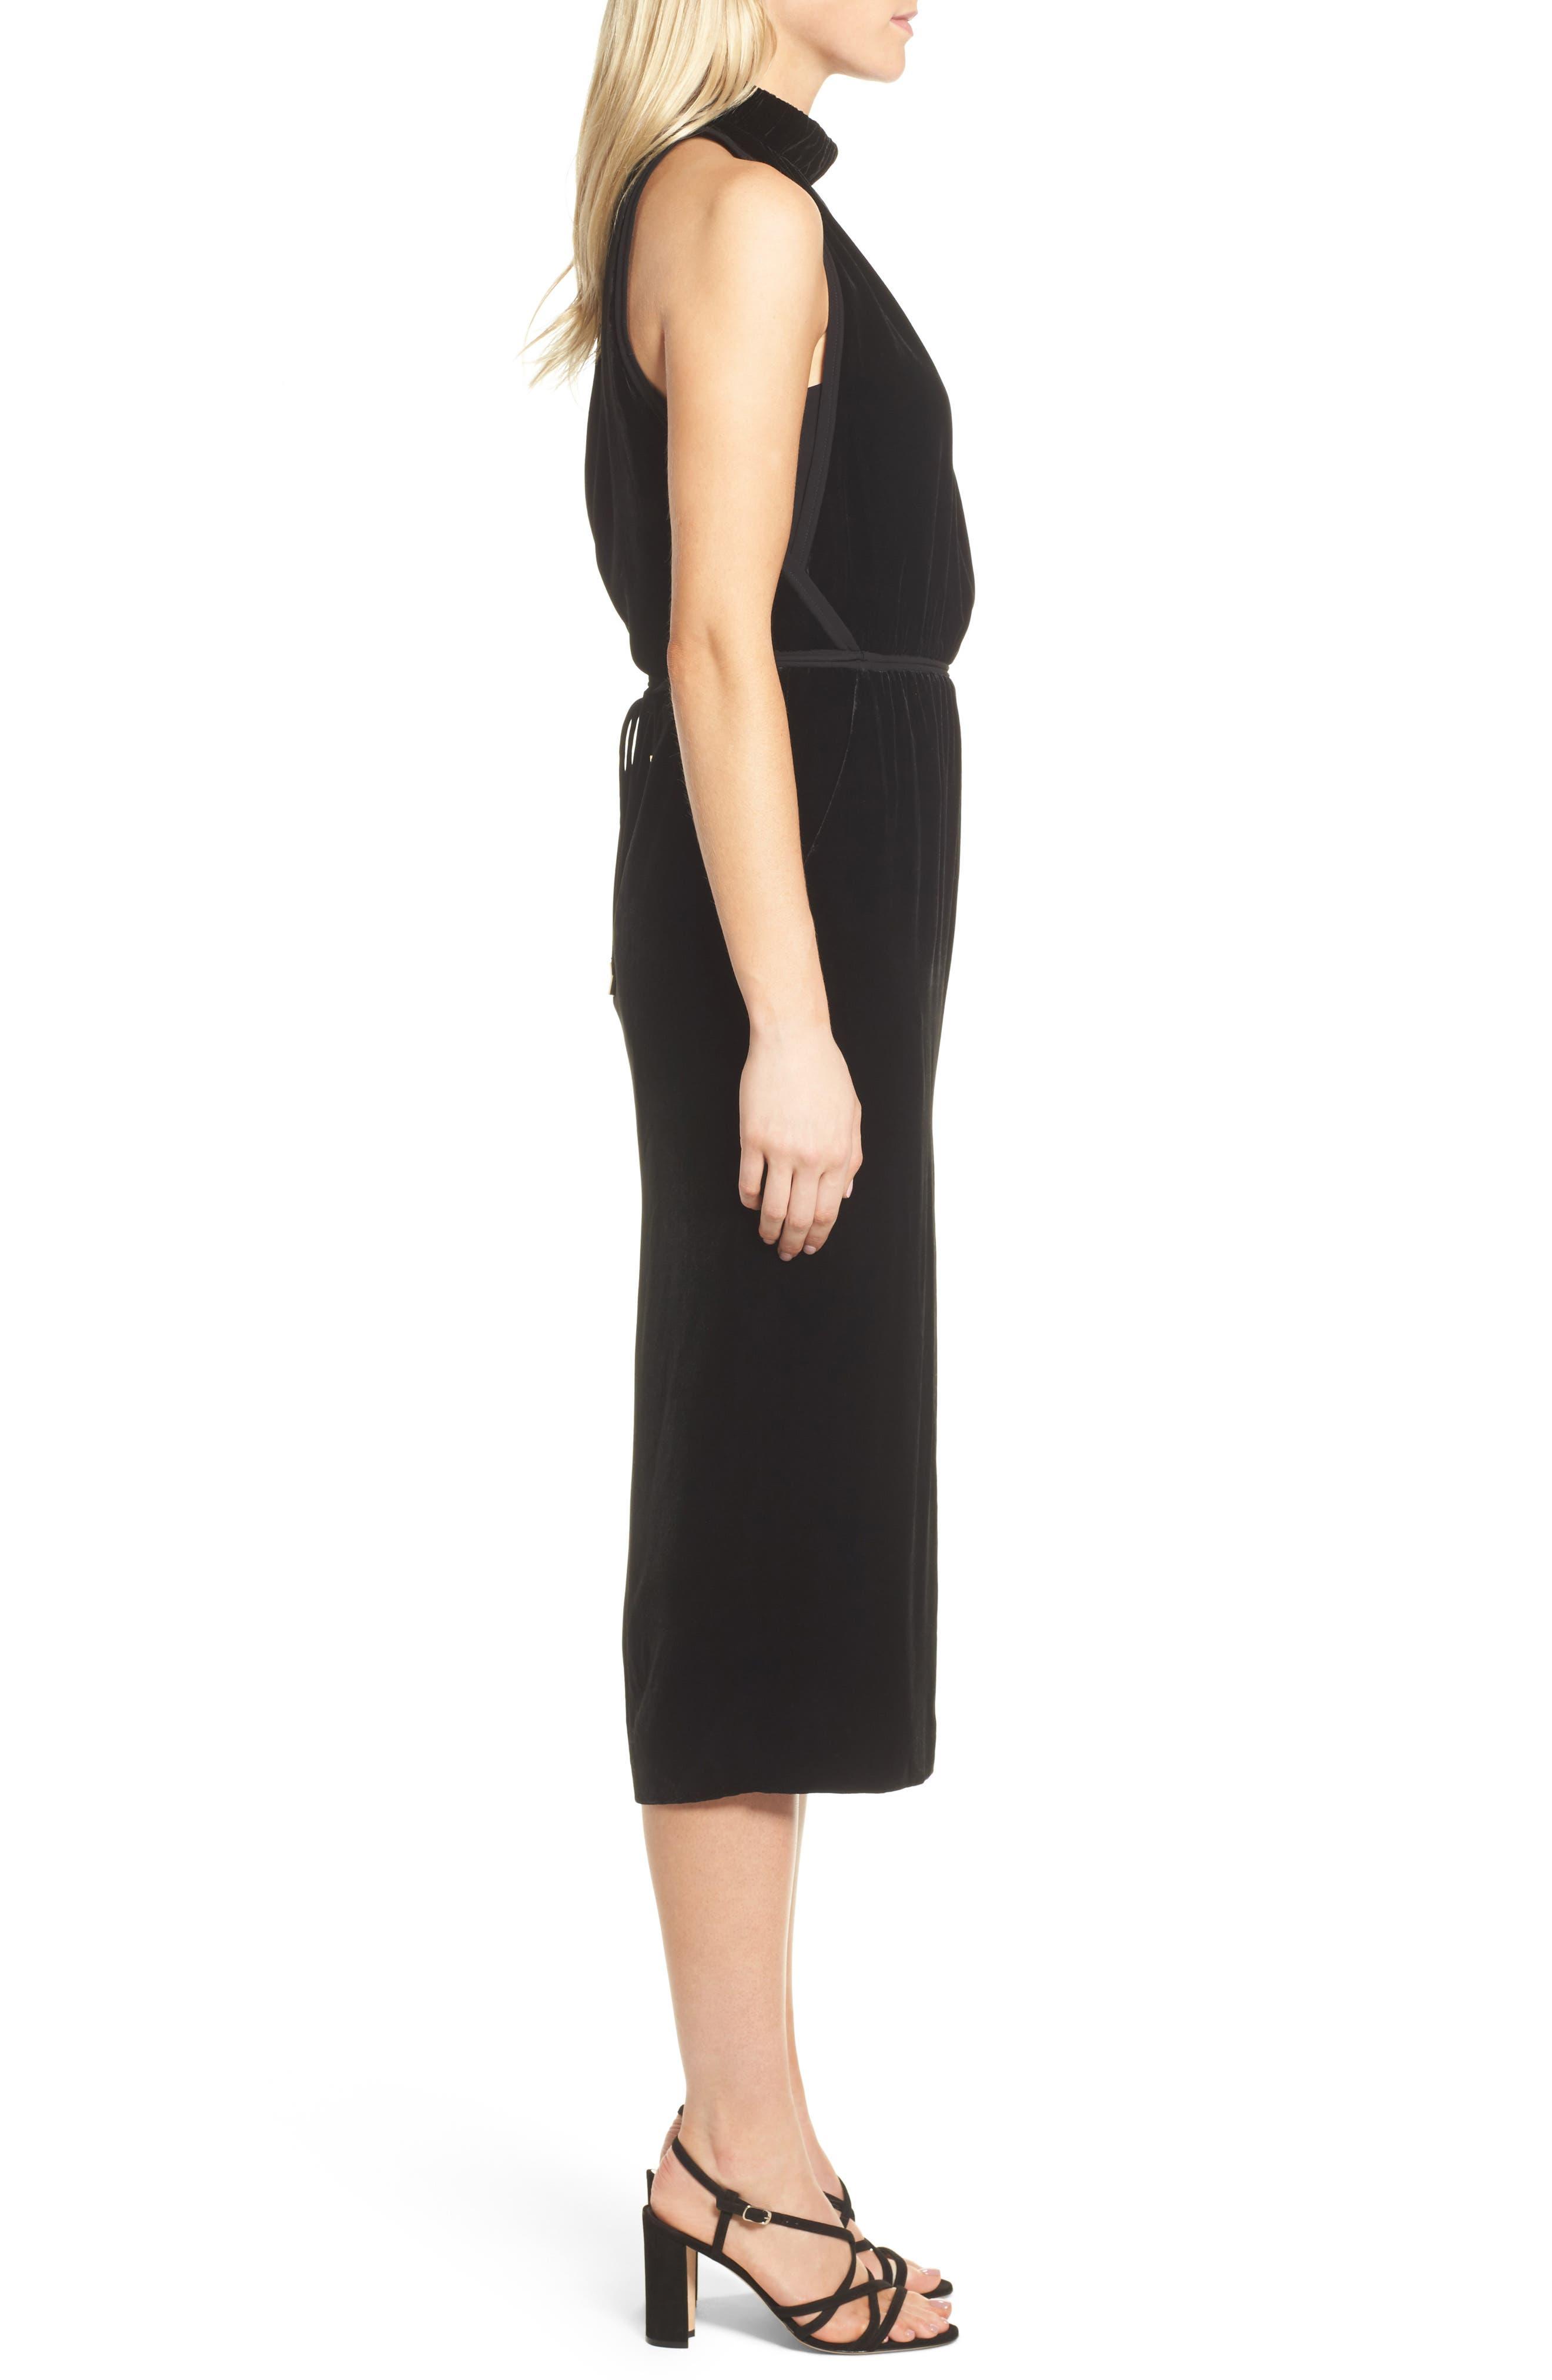 Difosia Velvet Midi Dress,                             Alternate thumbnail 3, color,                             Black